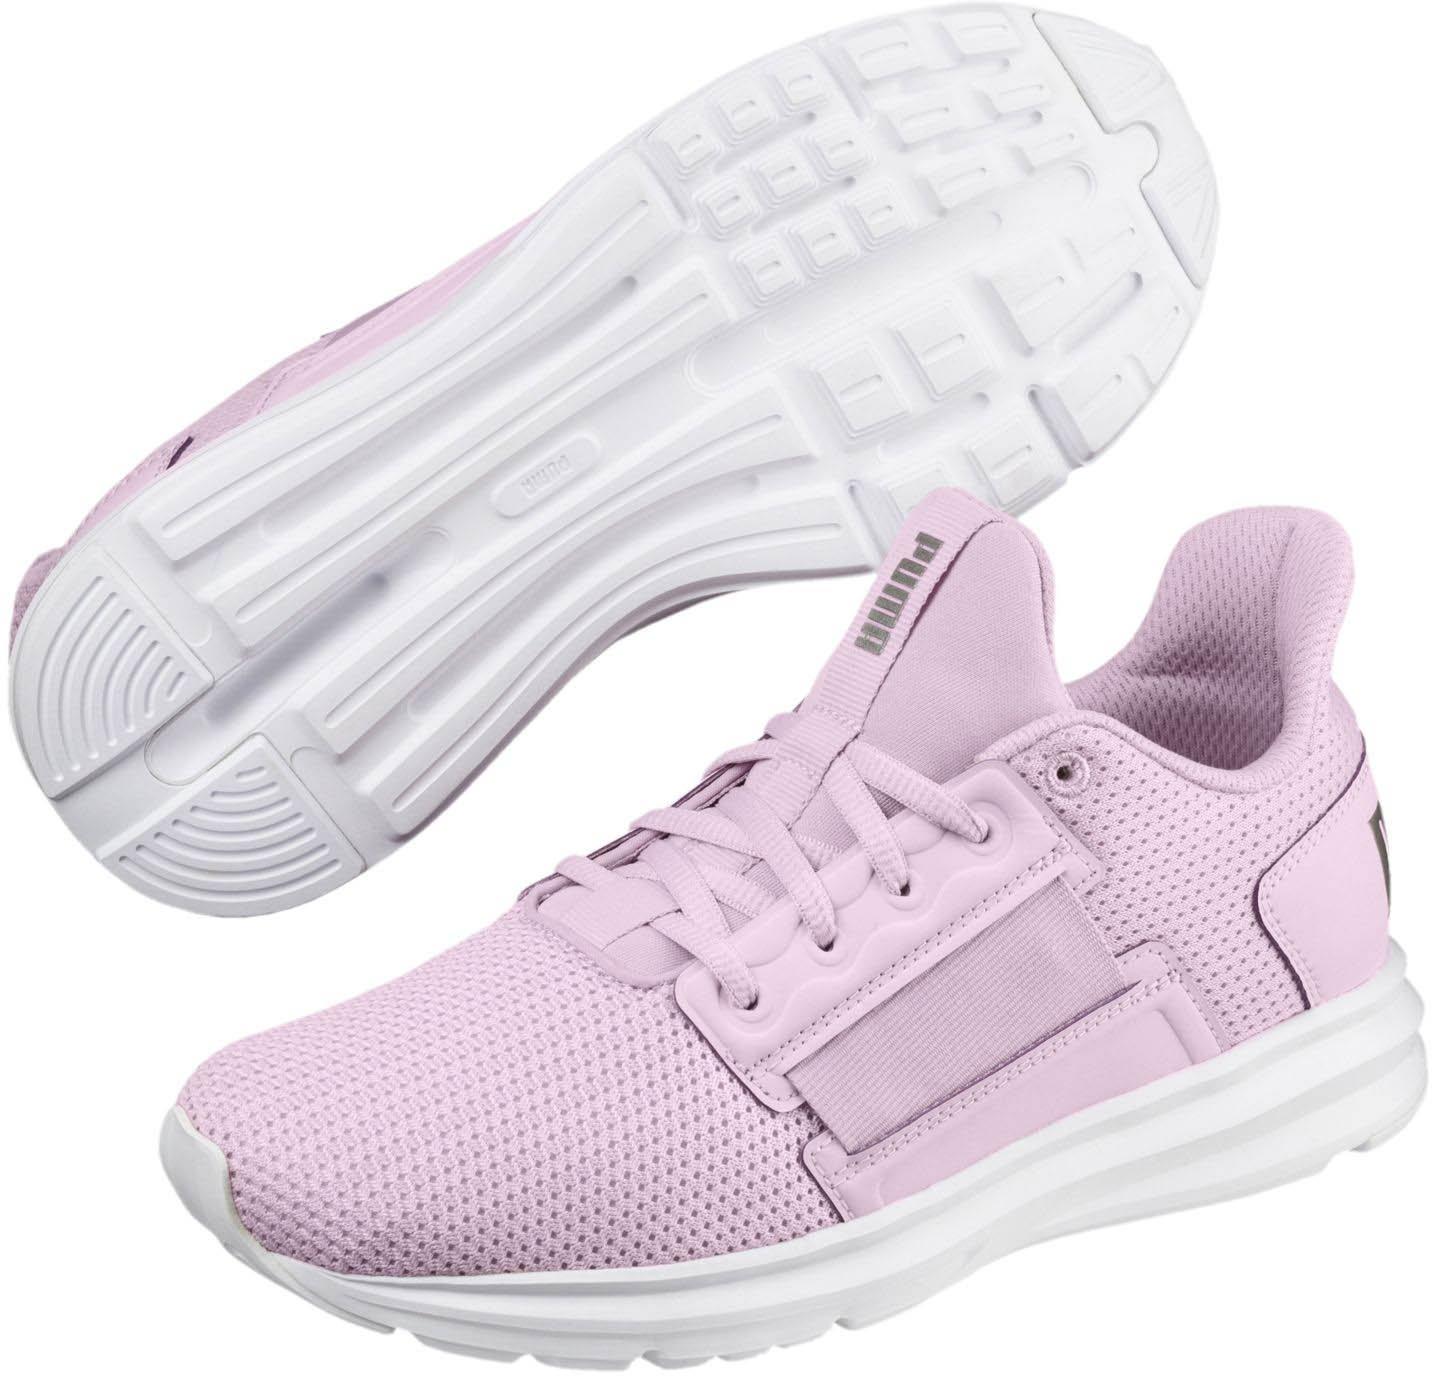 PUMA Women's Enzo Street Wn Sneaker B078C8WHVT 8 M US|Winsome Orchid-puma Silver